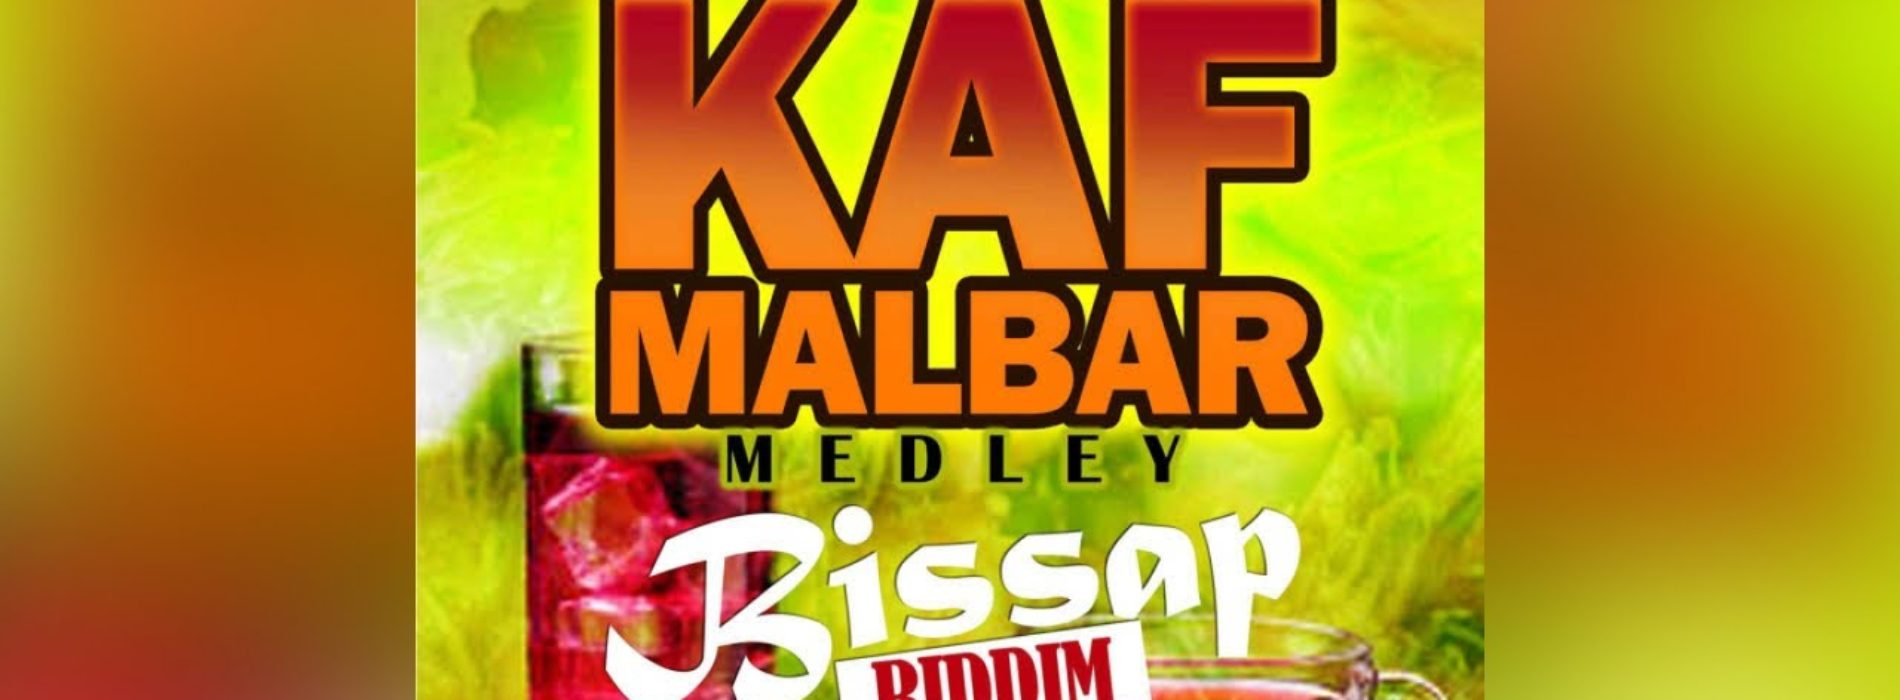 Kaf Malbar Ft. Dj Sebb – Bissap Riddim Medley – Loué / She Call Me (Babar ) / Bonda -12/2020 (cover) – Décembre 2020